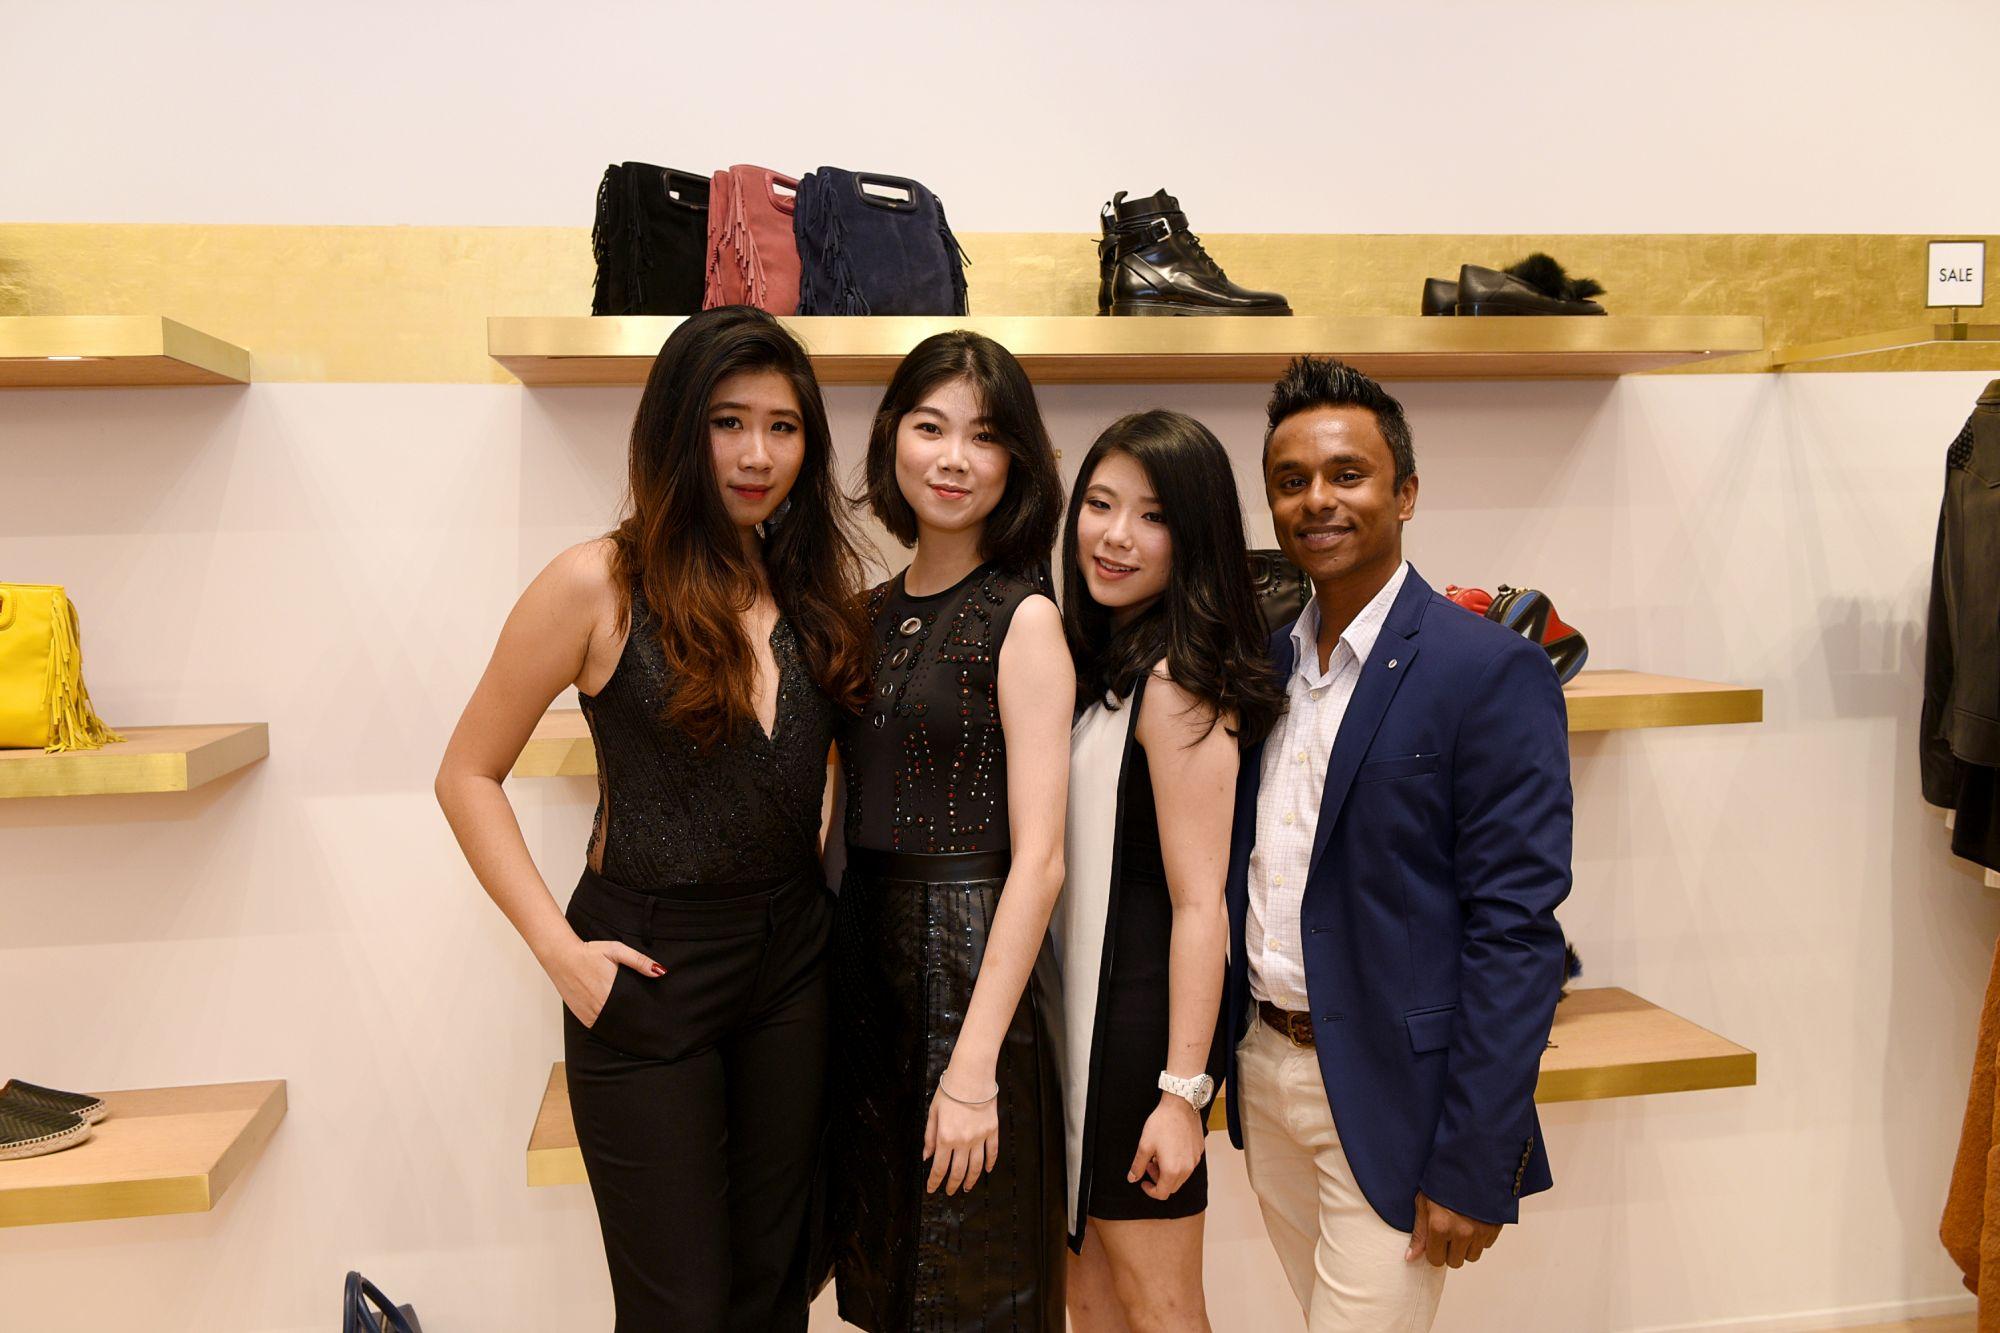 Emilia Wong, Jeslyn Xin Ying, Desiree Peh, Dinesh T